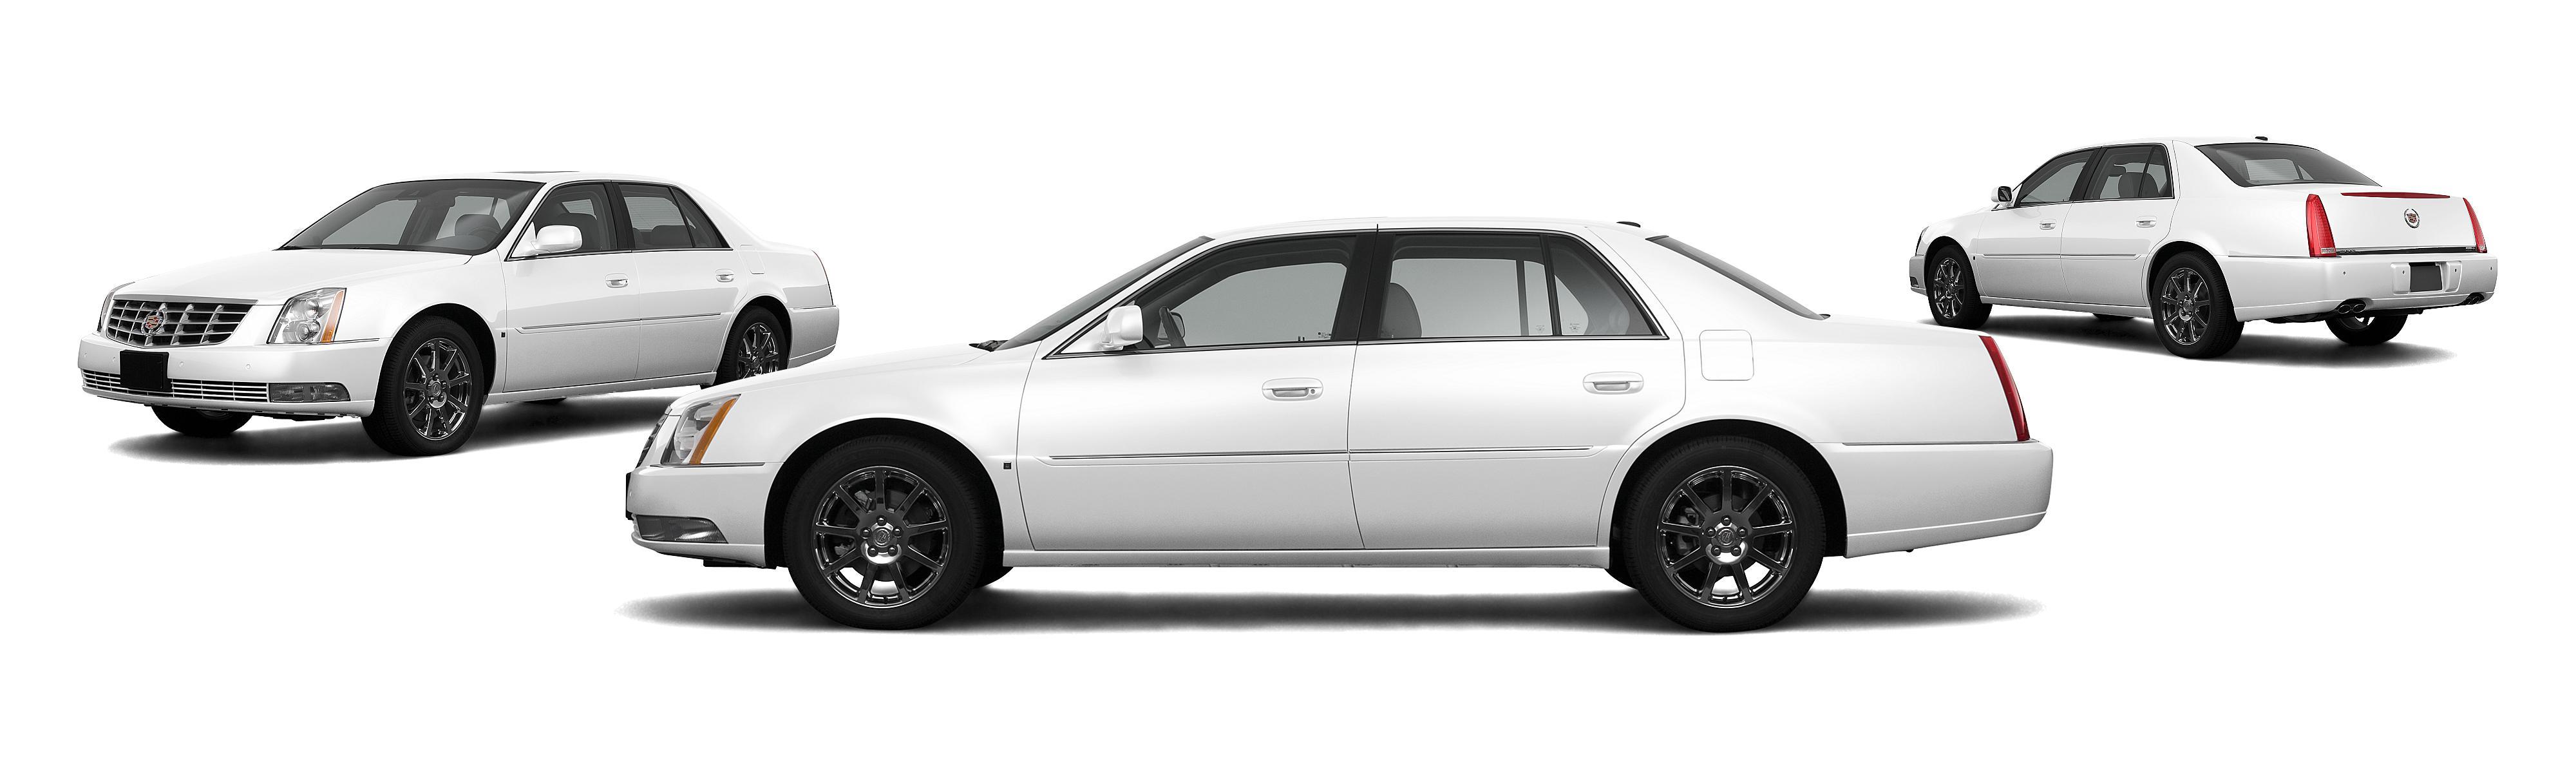 2008 Cadillac Dts Luxury Ii 4dr Sedan Research Groovecar 2006 Fuse Box